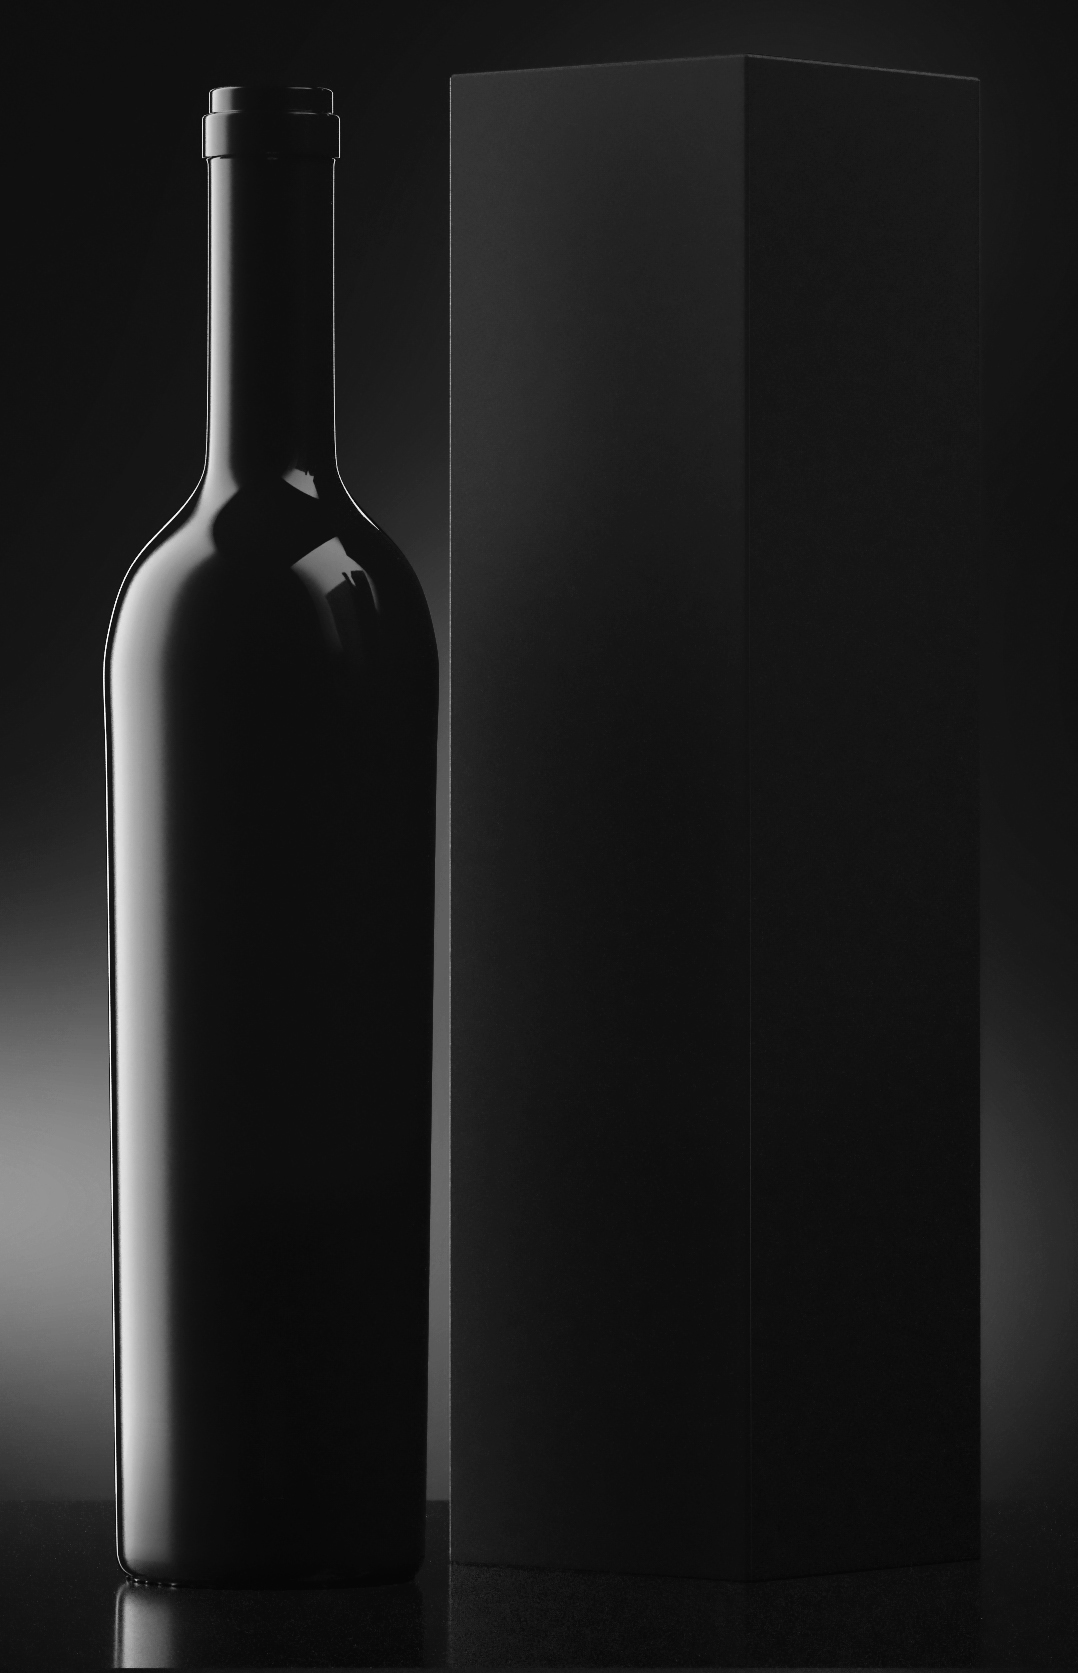 bottle wine Mockup mock-up mock up free freebie black